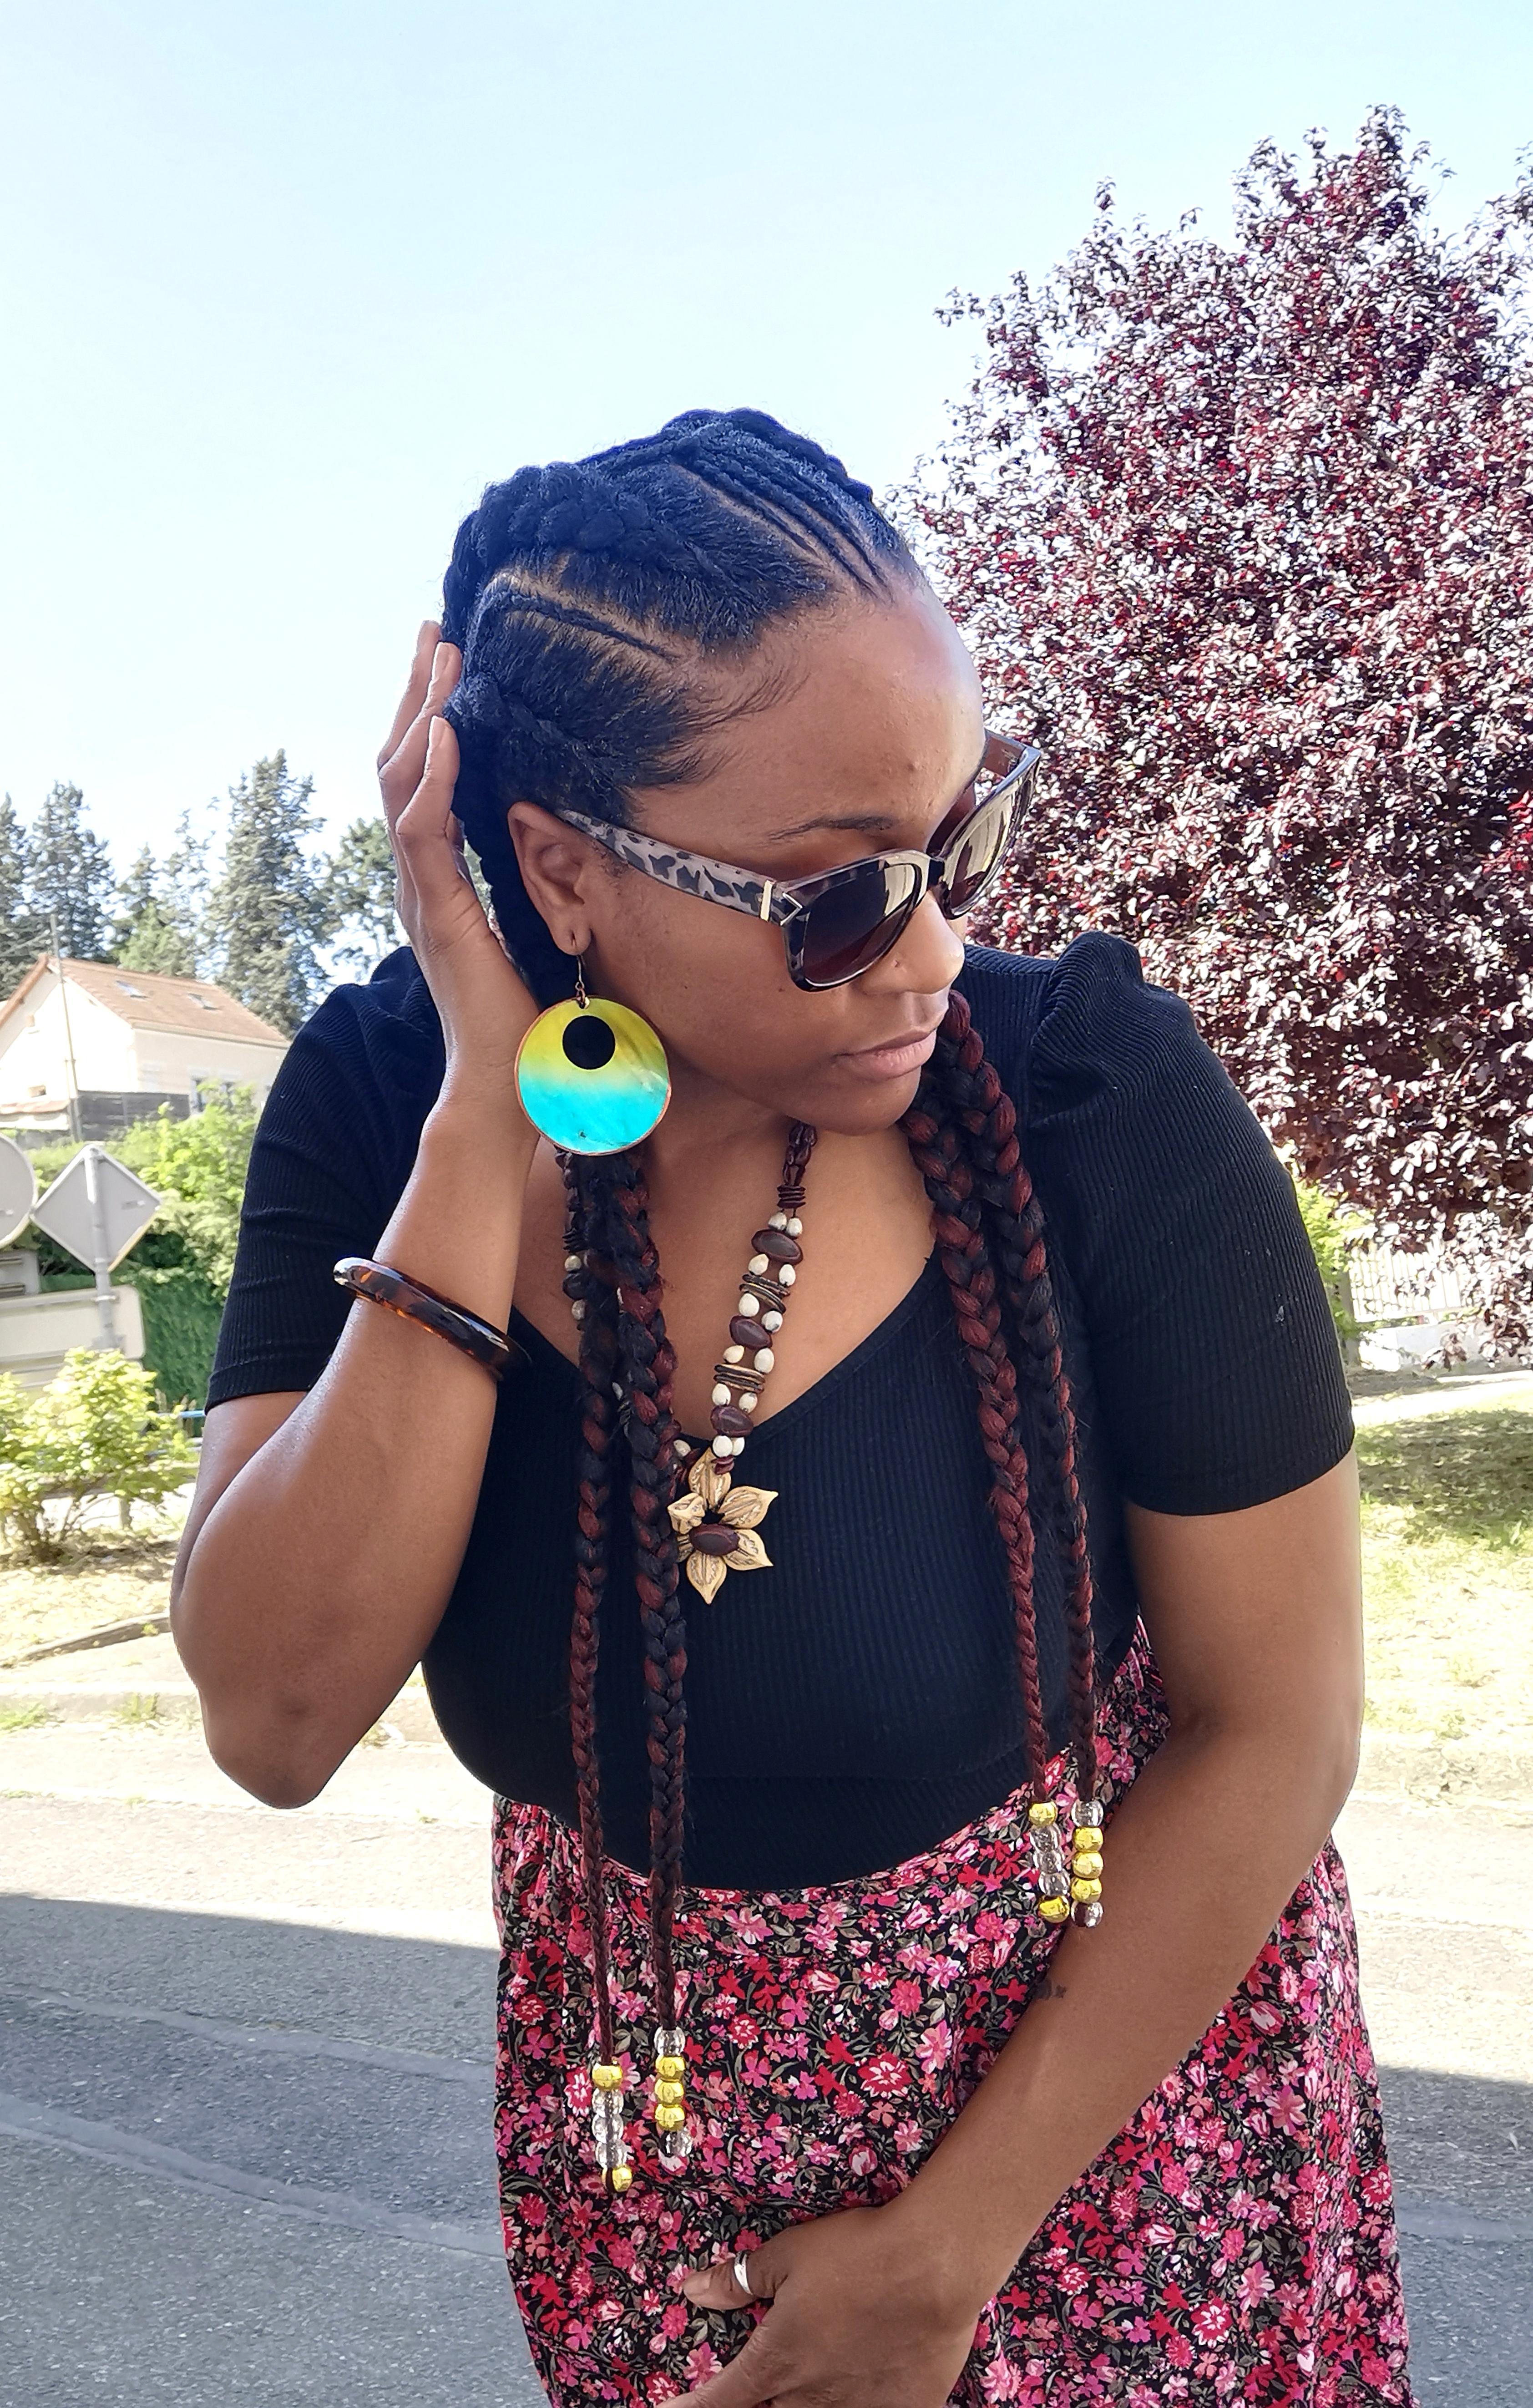 salon de coiffure afro tresse tresses box braids crochet braids vanilles tissages paris 75 77 78 91 92 93 94 95 SVIREGVX